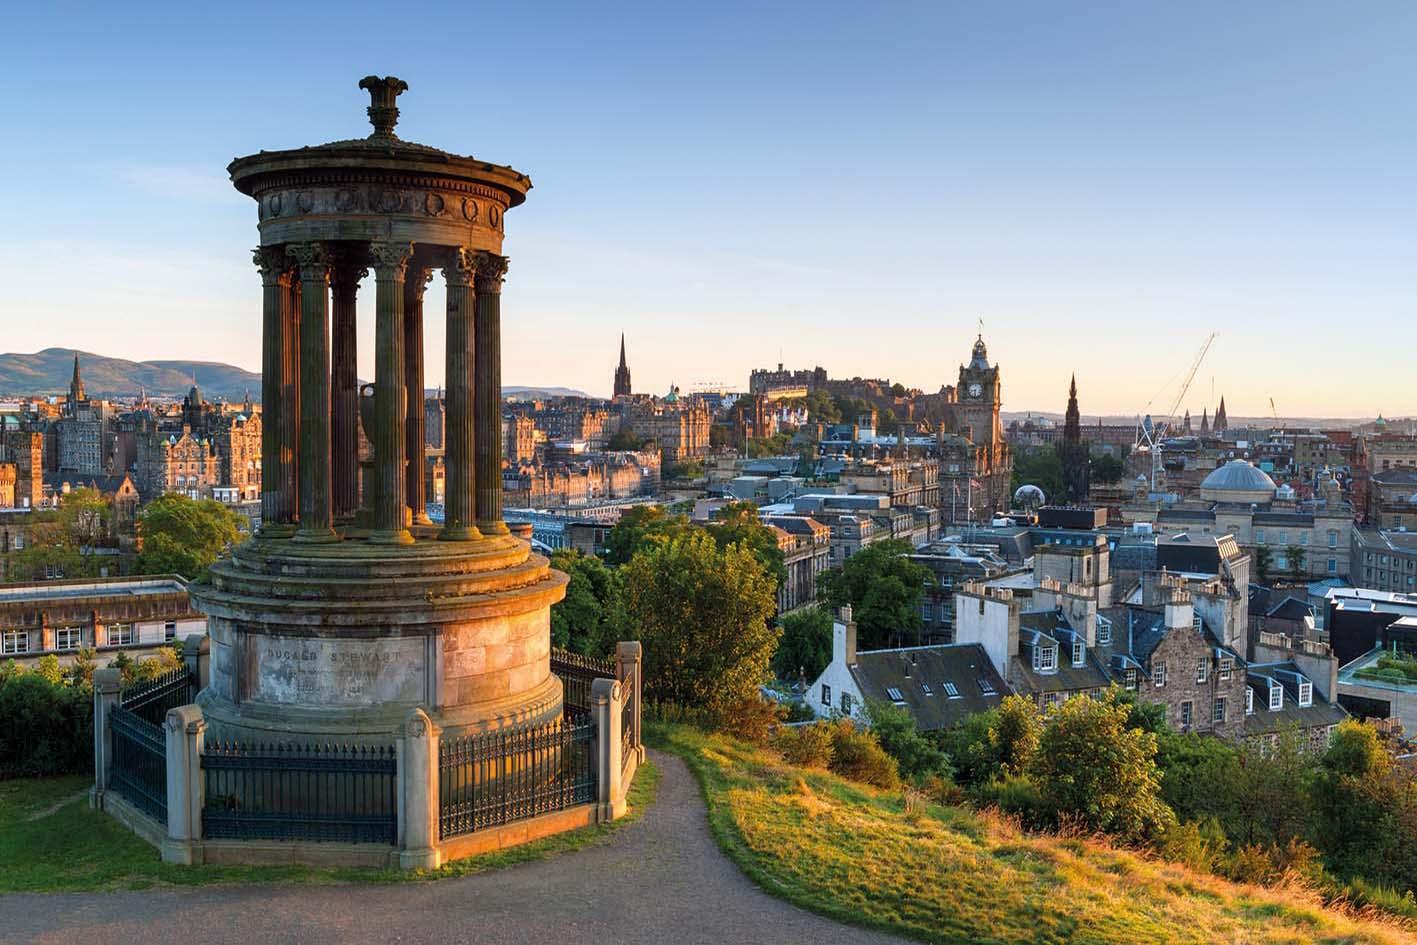 Edimburgo - The Scottish Experience<br>Heriot Watt University